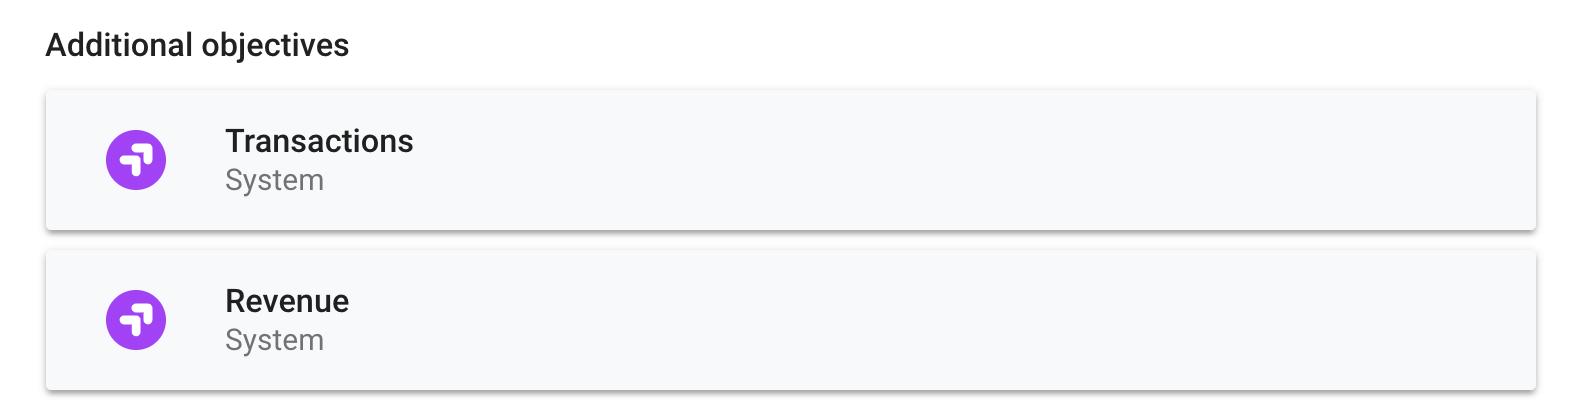 Objetivos de e-commerce no Google Optimize